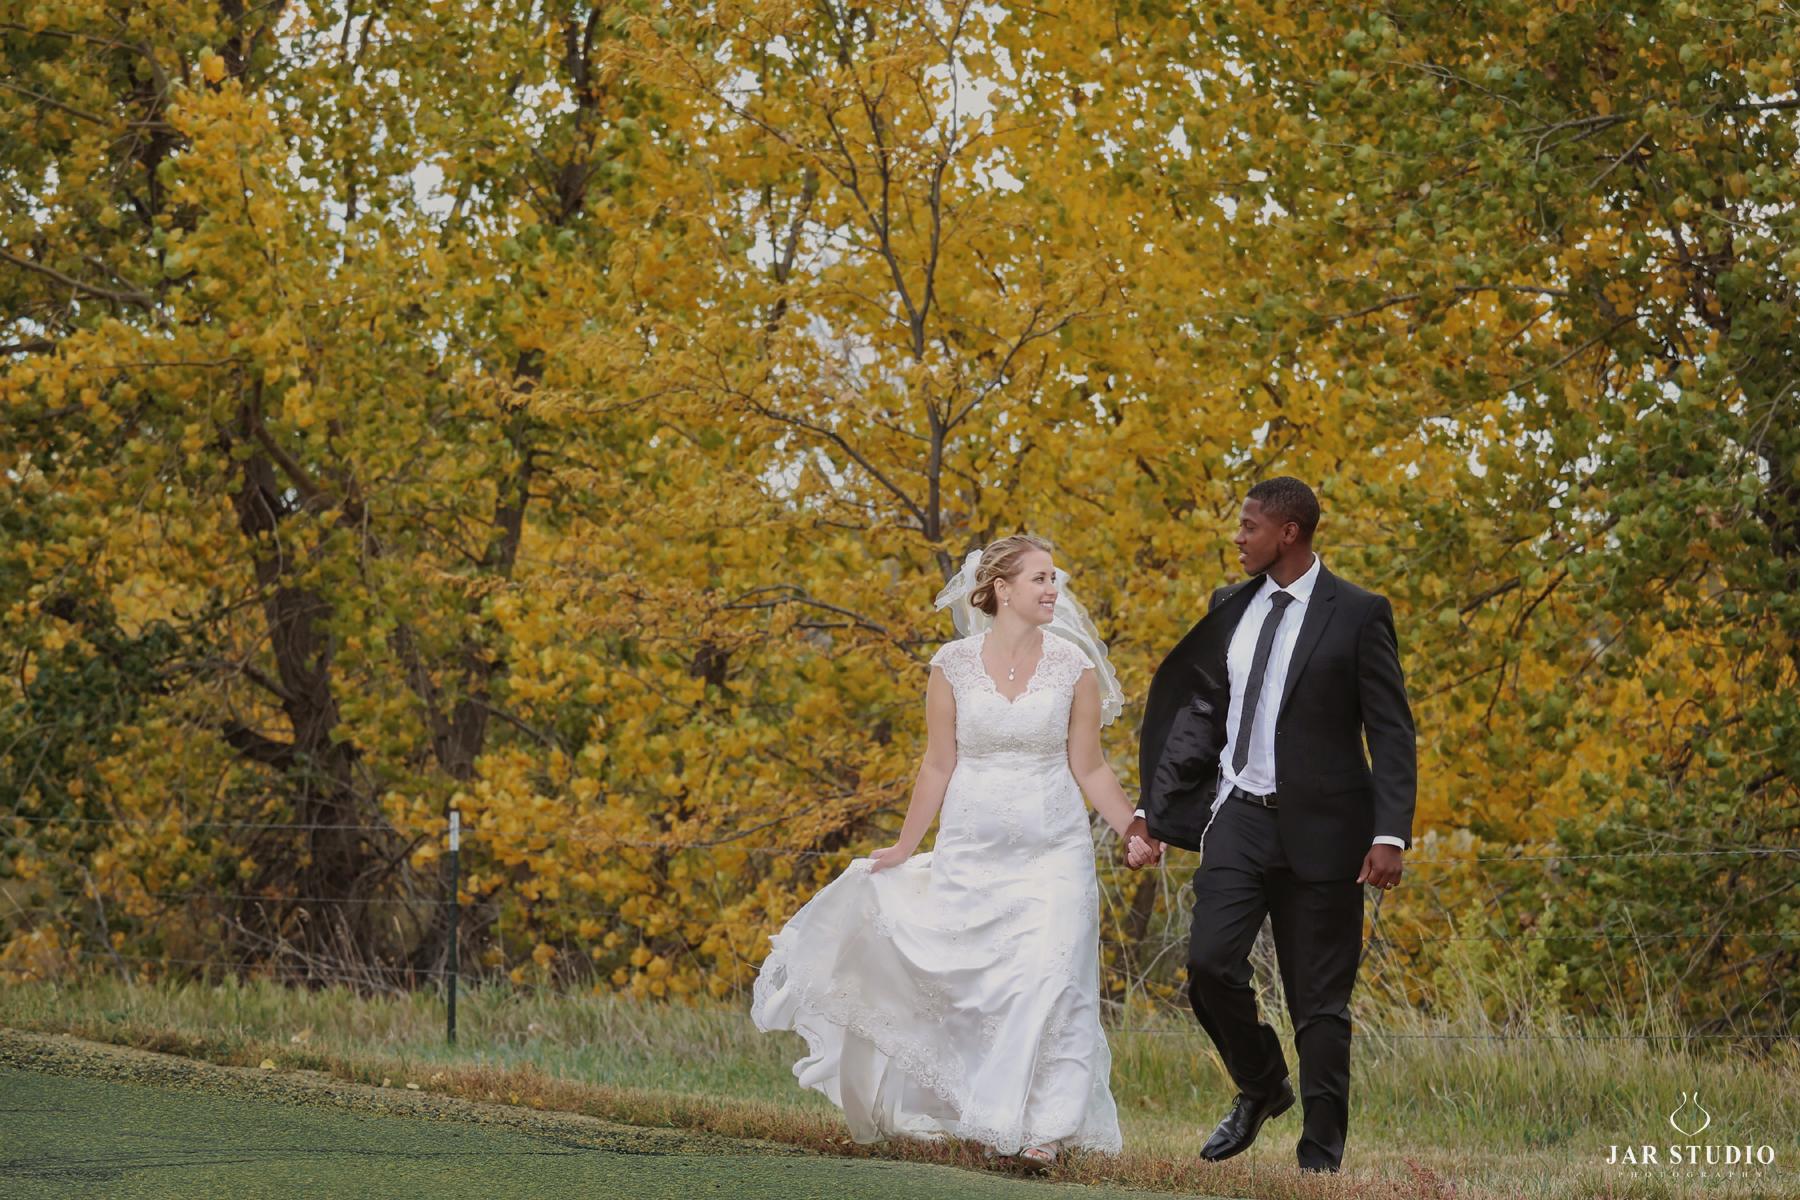 20-gorgeous-fl-fall-wedding-outdoor-portraits-jarstudio.jpg